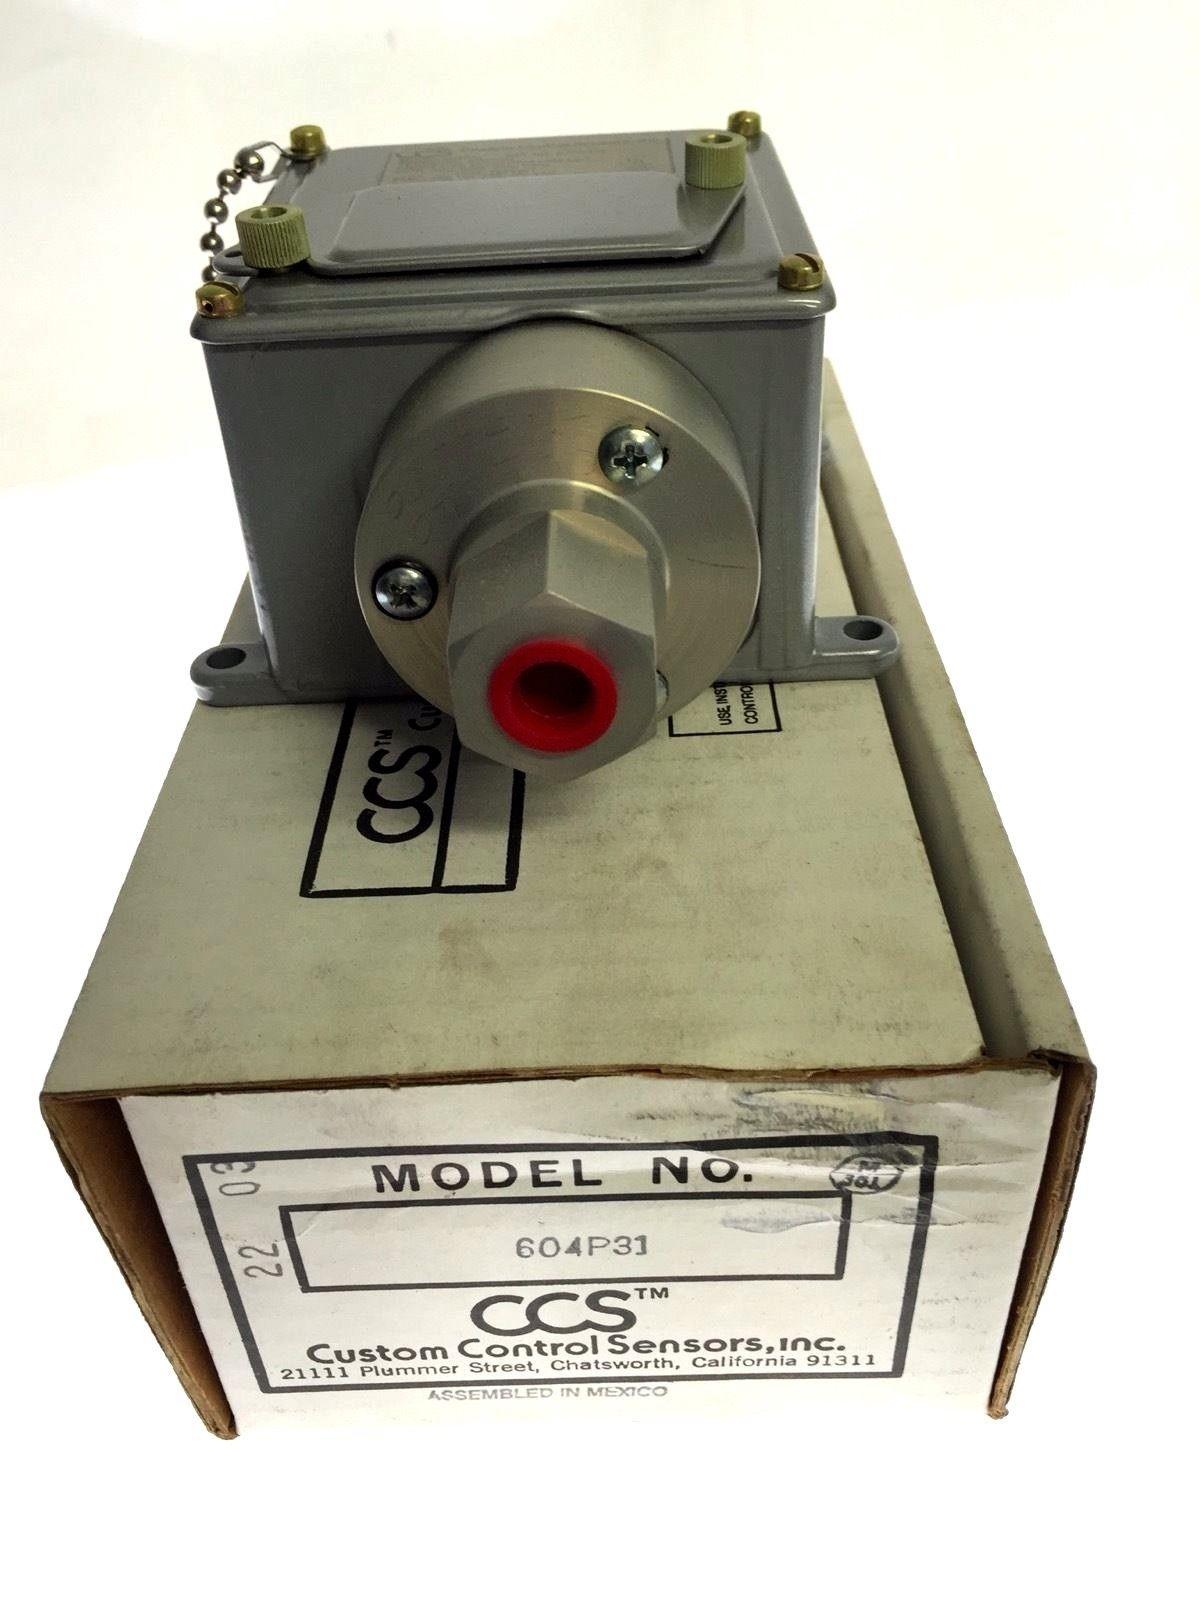 CUSTOM CONTROL SENSORS 604P31 2000/4700 PSIG 15A PRESSURE SWITCH NEW IN BOX H89 1